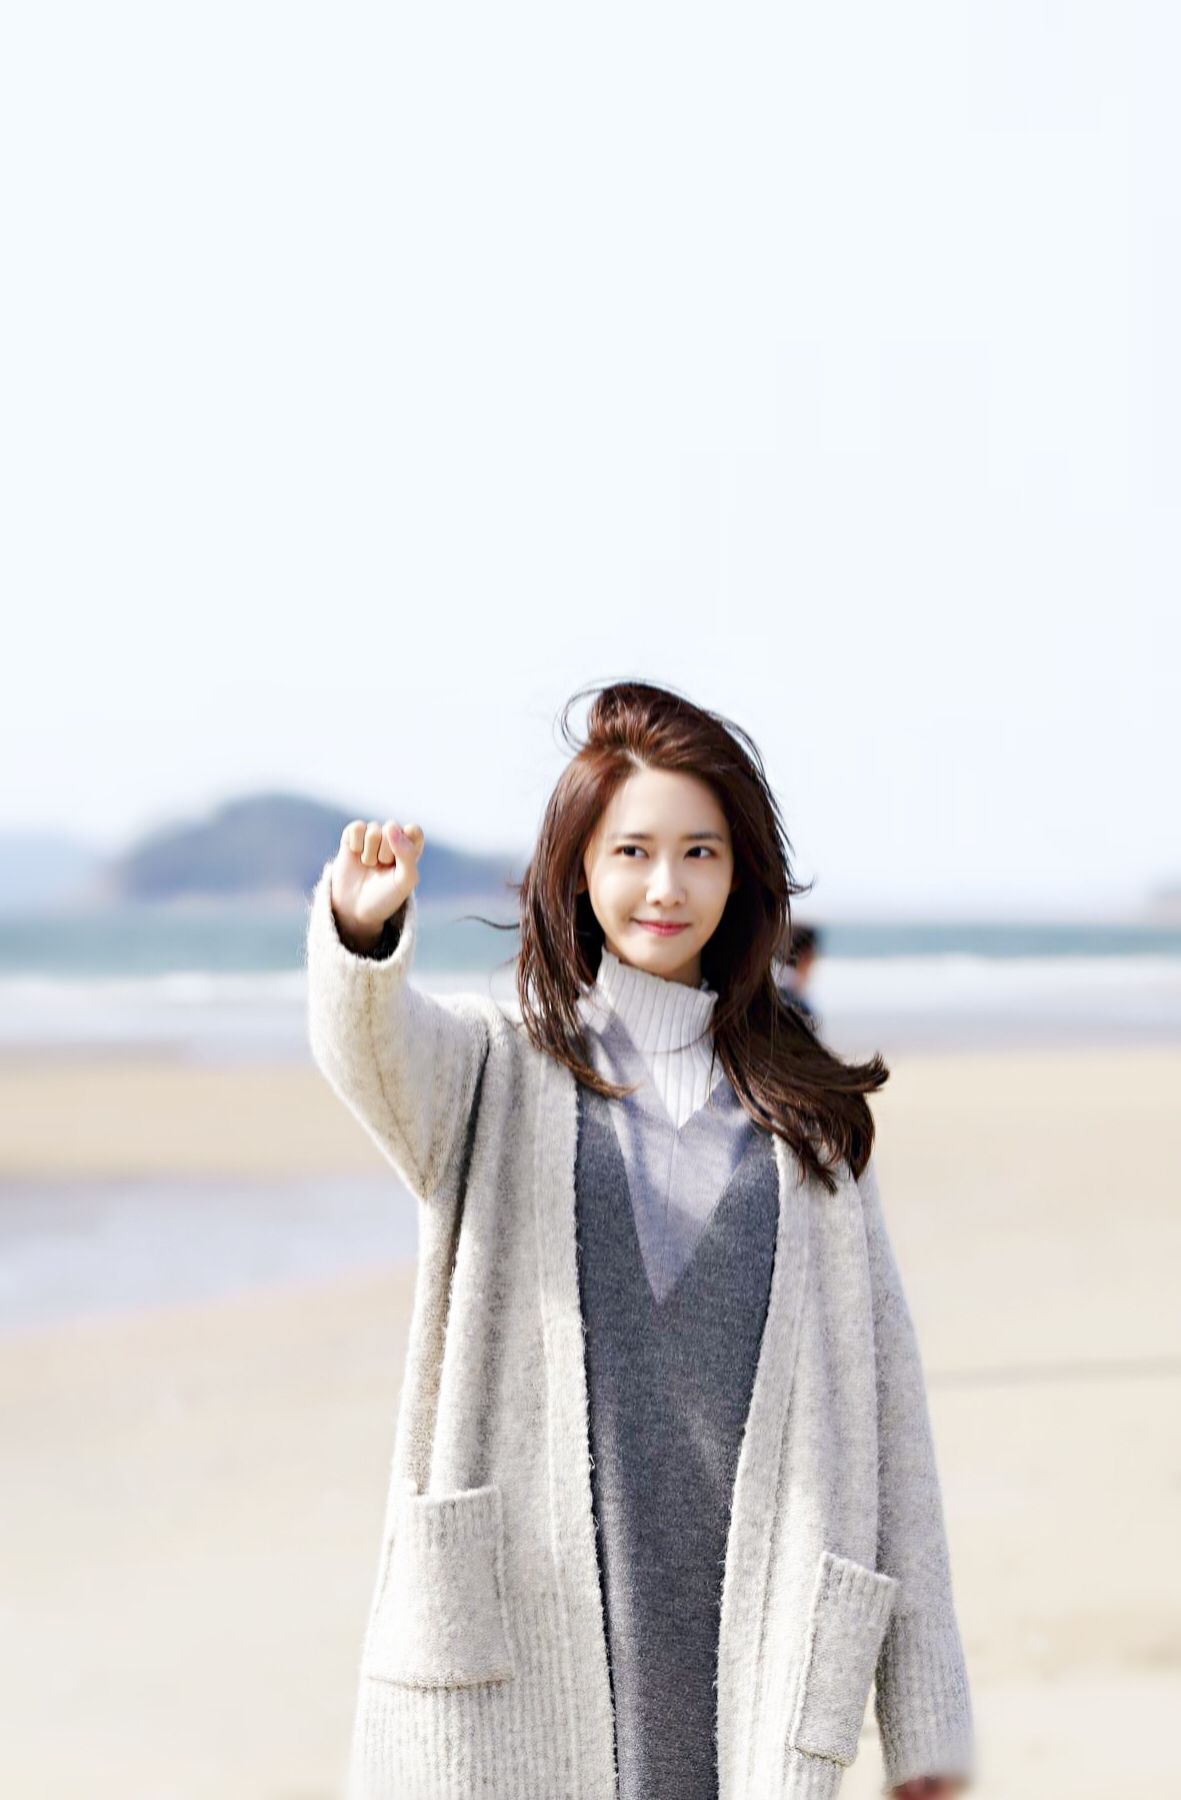 THE K2 SNSD Yoona iPhone wallpaper/Lockscreen  iPhone Wallpaper for SNSD/Girls Generation/GG